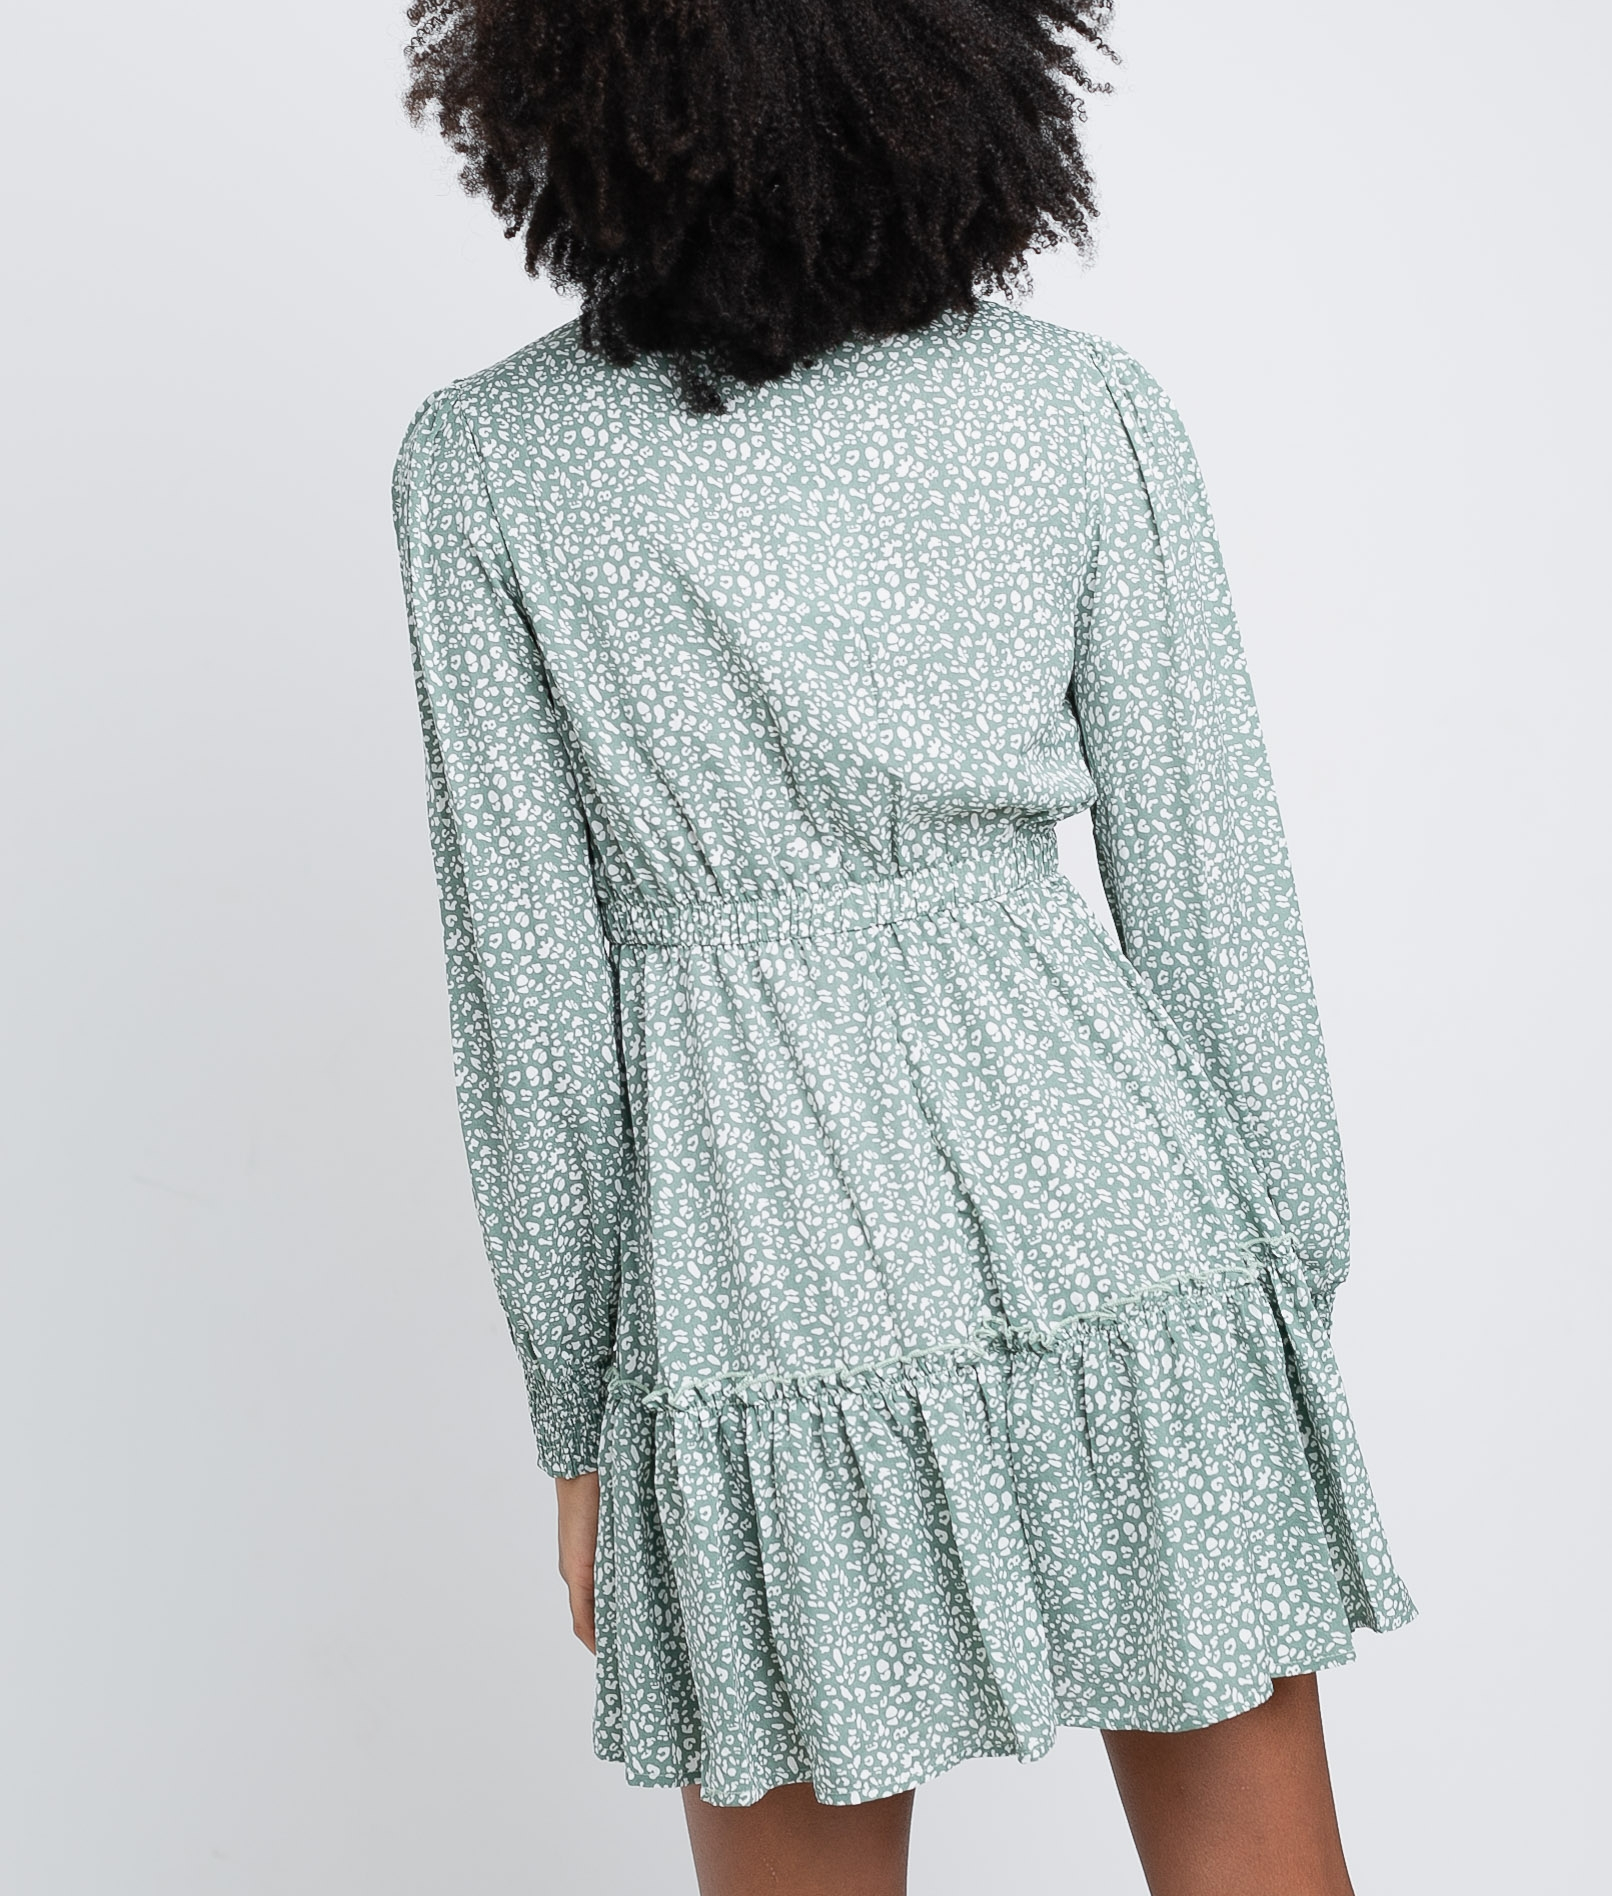 EMOR DRESS - GREEN